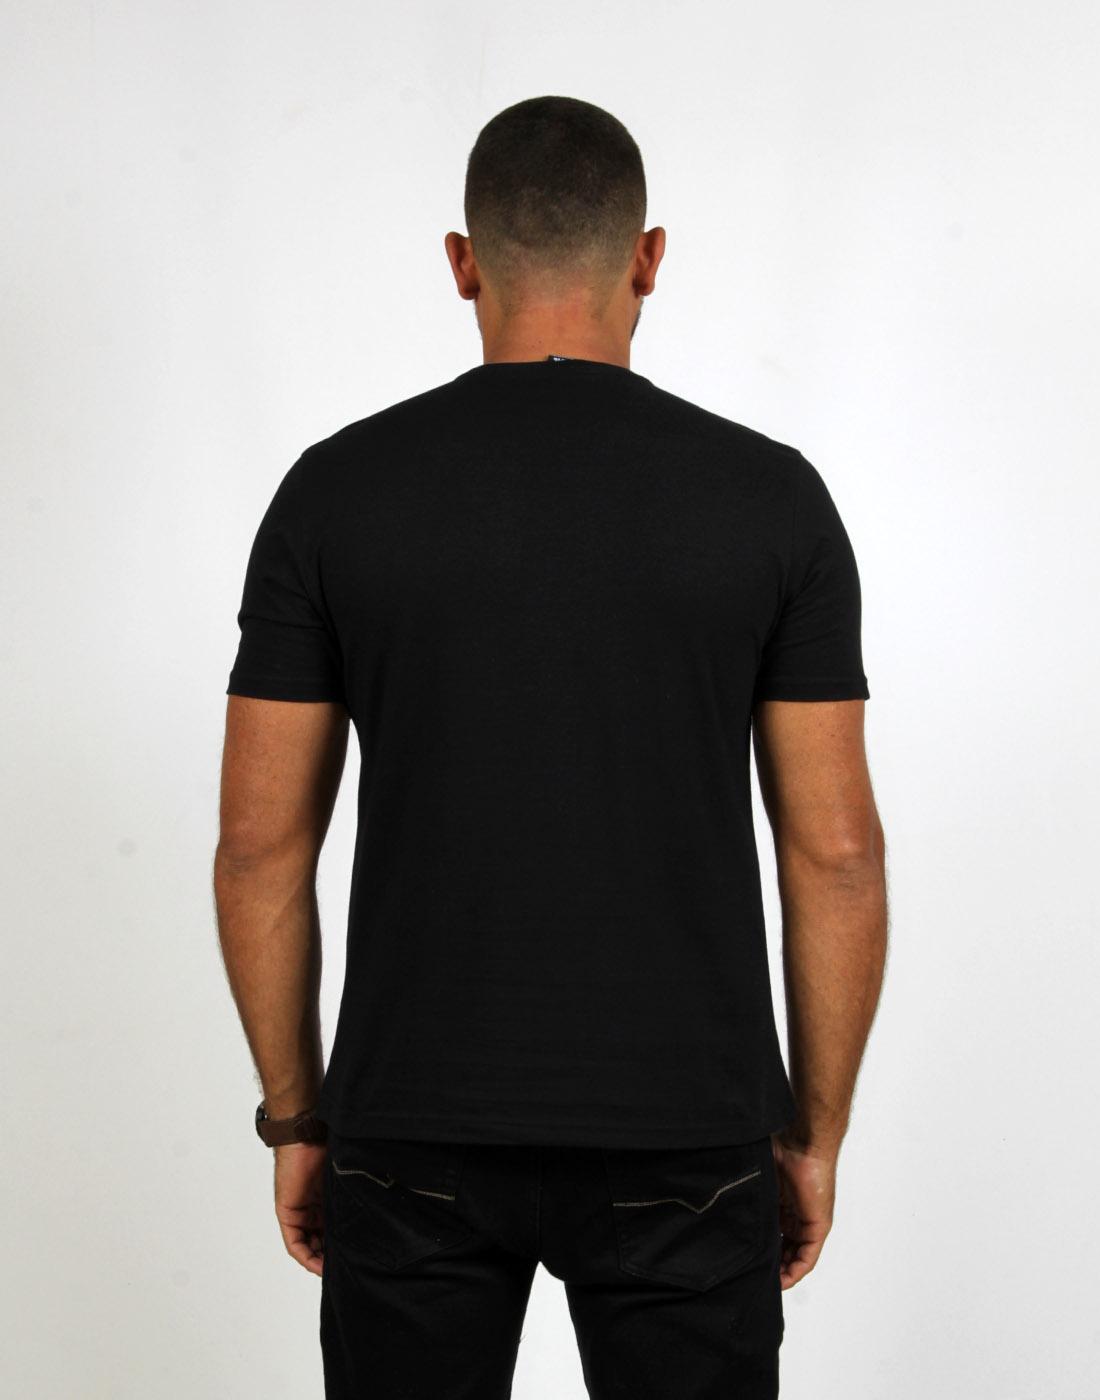 Camiseta Masc. Fashion Basic Preto Fatal